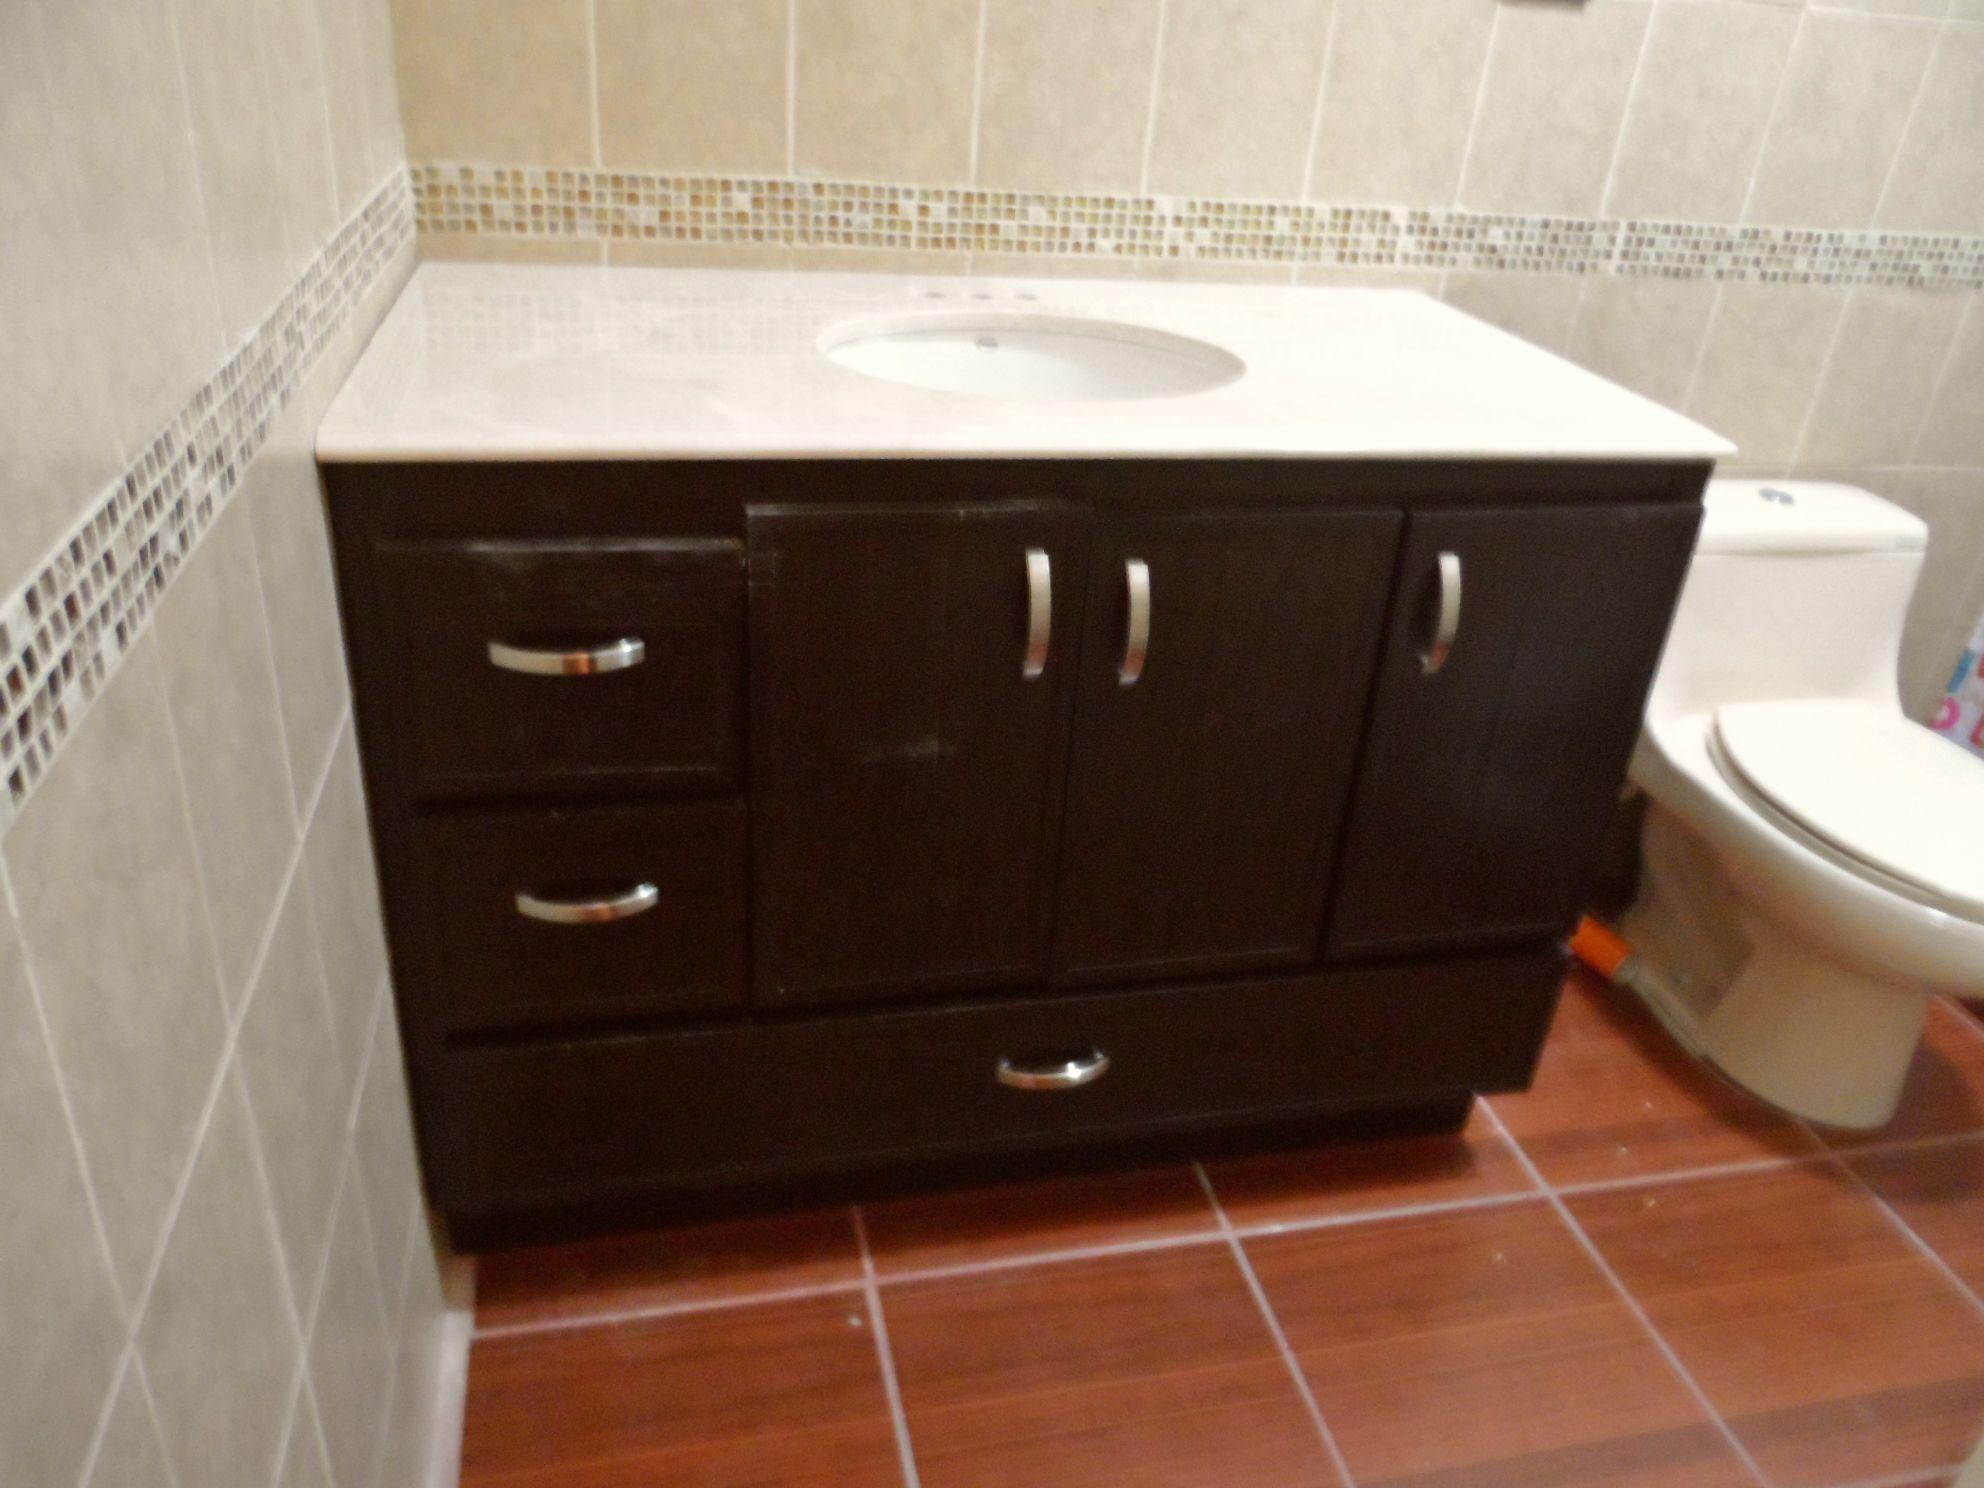 RIGID PLASTIC BATHROOM CABINETS